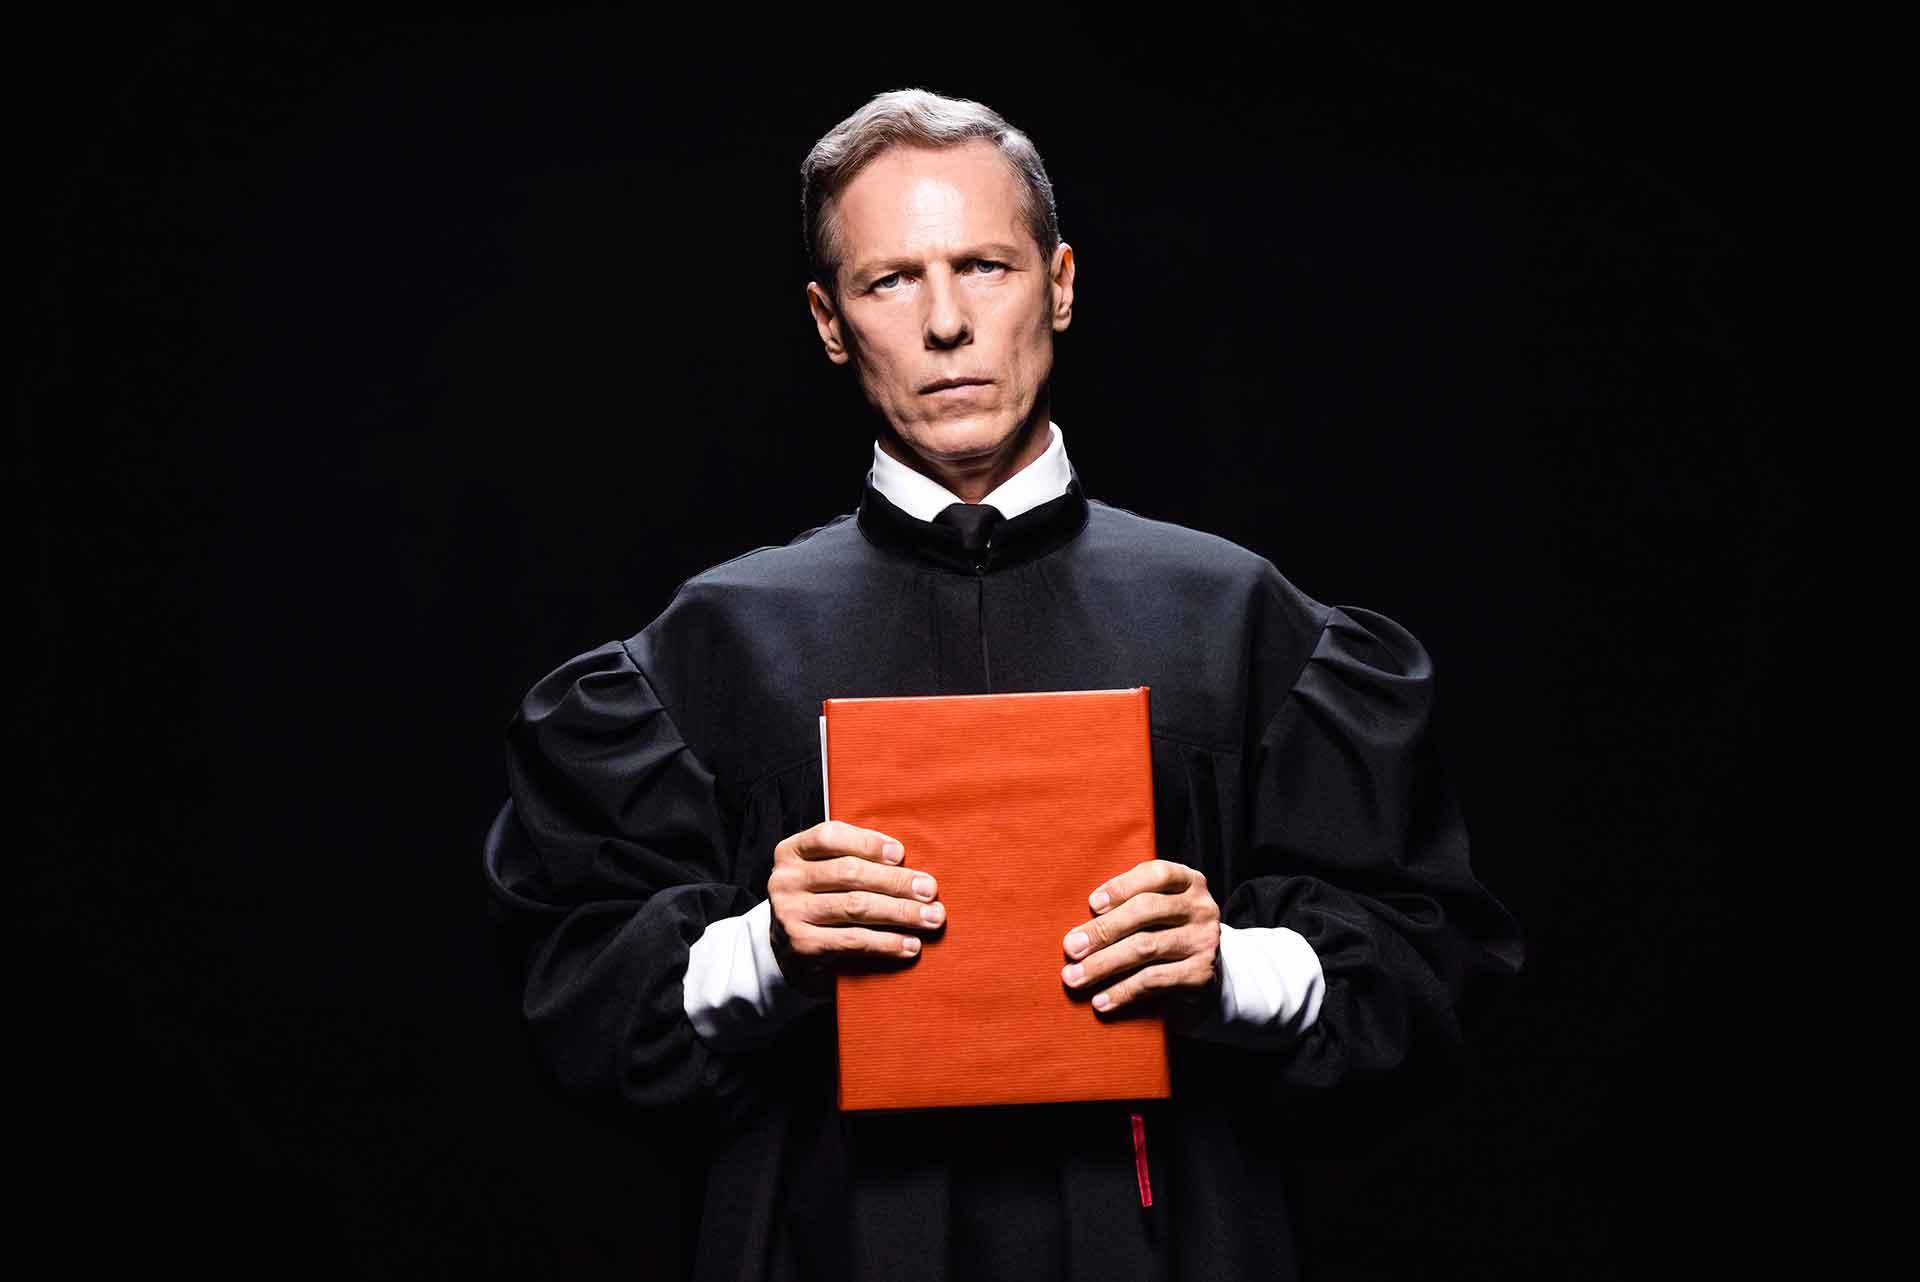 Strafrechtadvocaat strafrecht advocaat - Weening Strafrechtadvocaten